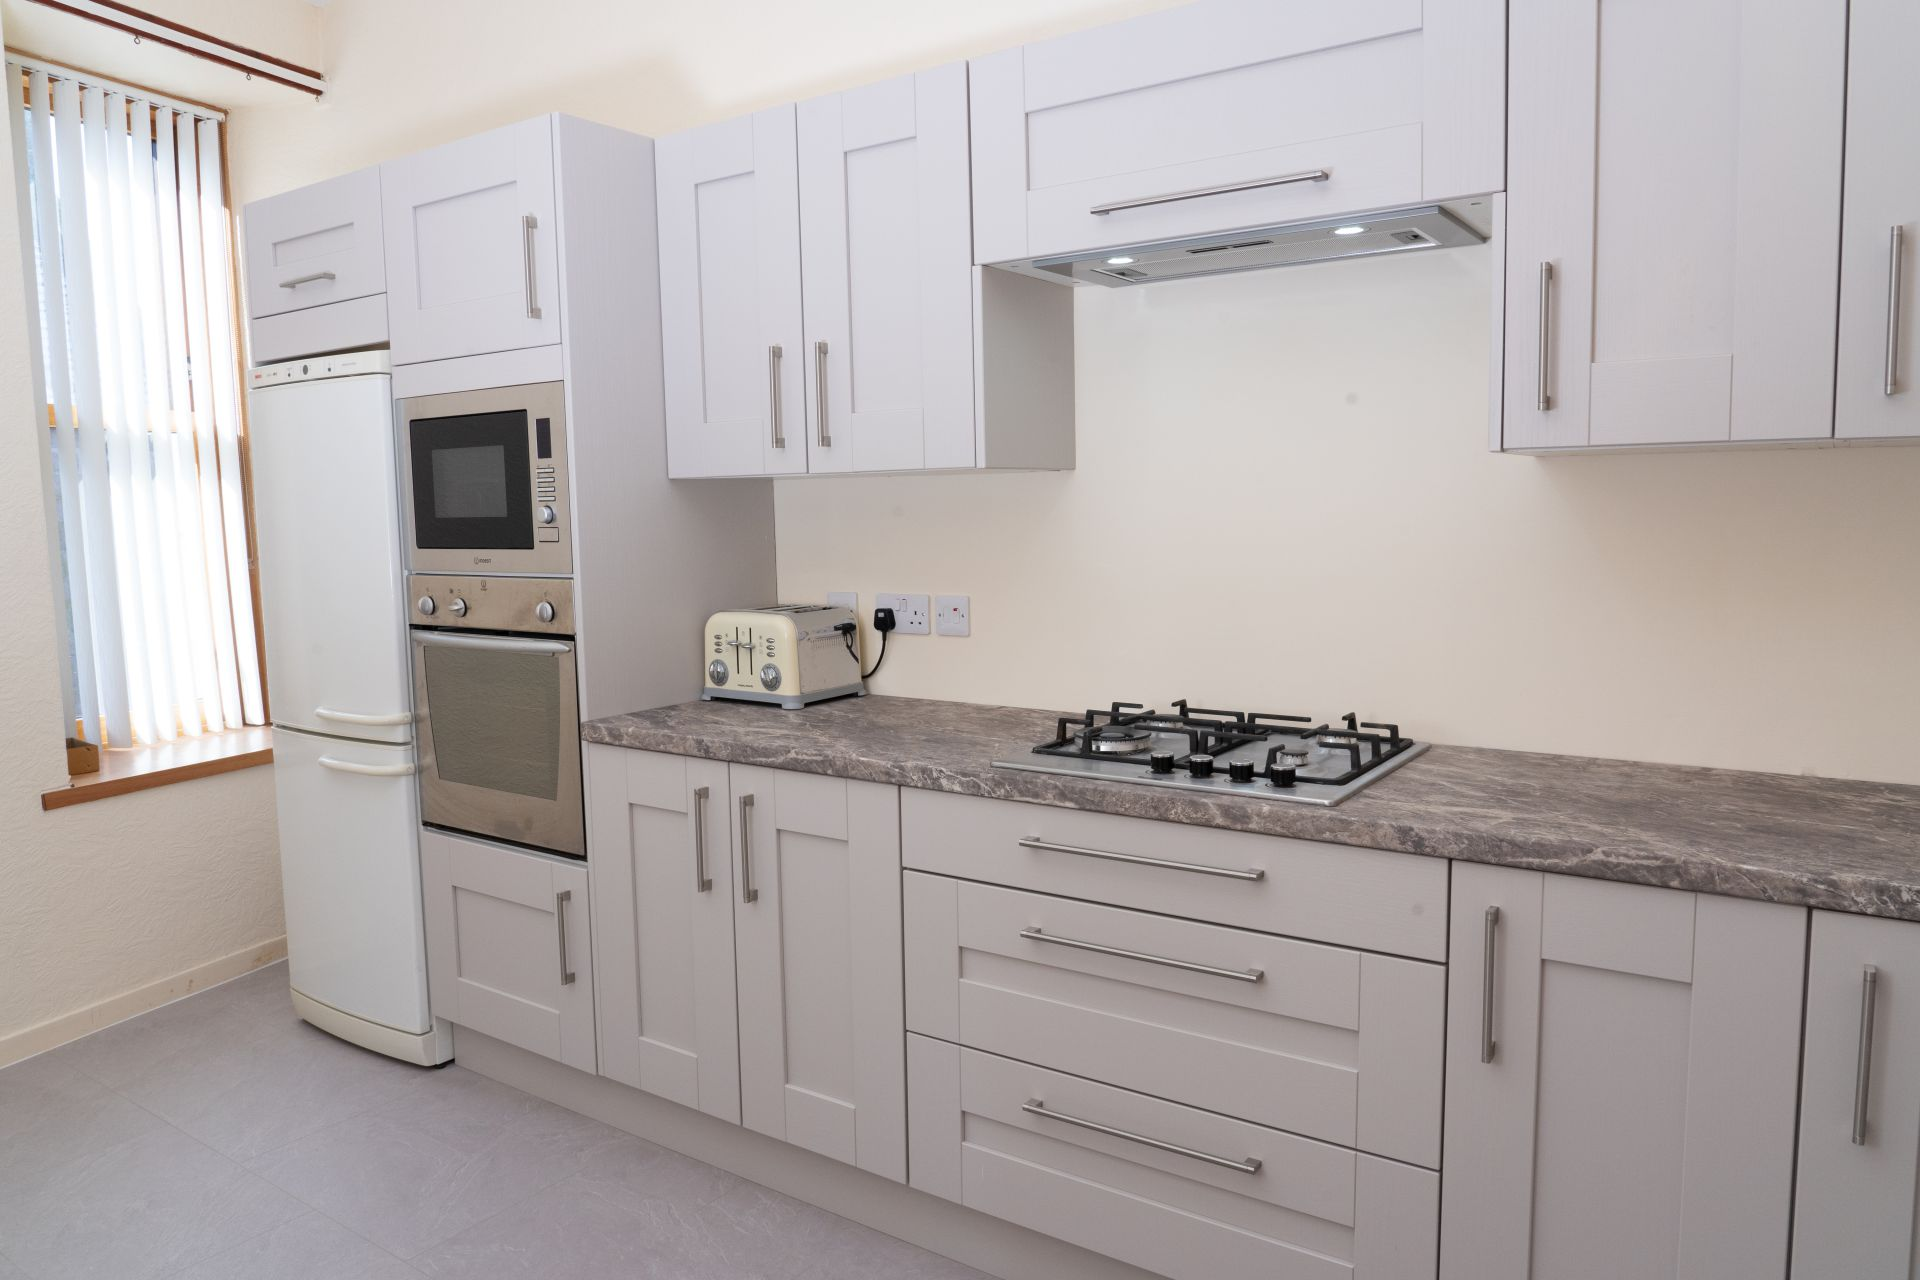 ARD-Properties-Development-Sites-Buy-Homes-Rent-Aberdeenshire-Rentals-2a-St-Andrew-Streeet-Peterhead-Banner (14)